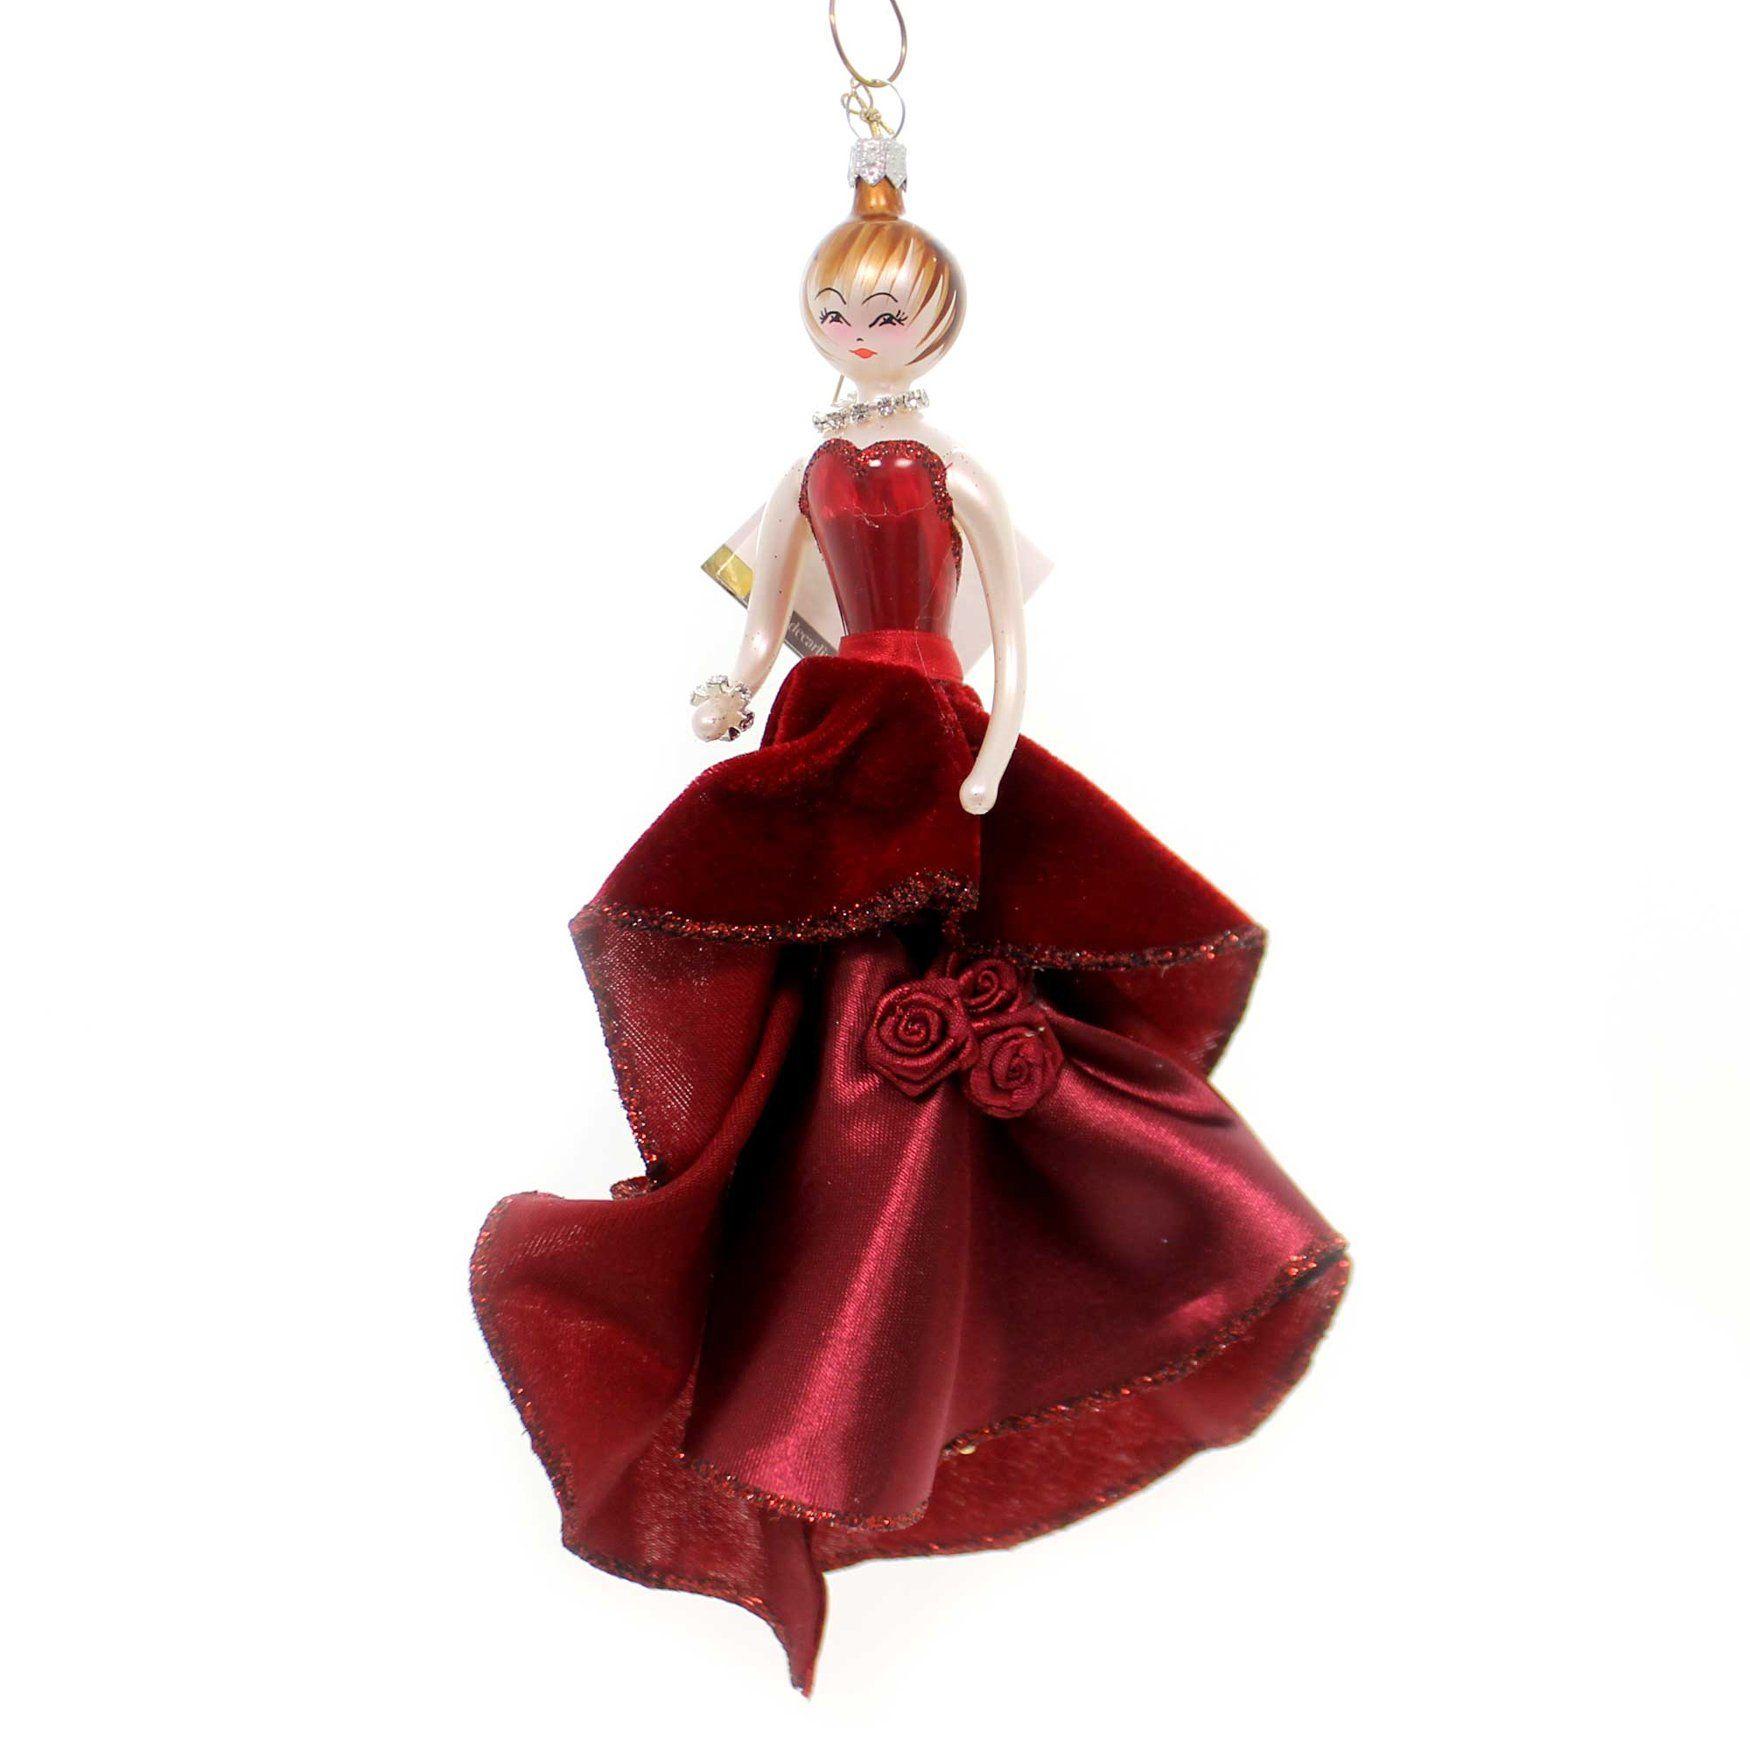 De Carlini Lady In Burgundy Evening Gown Italian Christmas Ornament